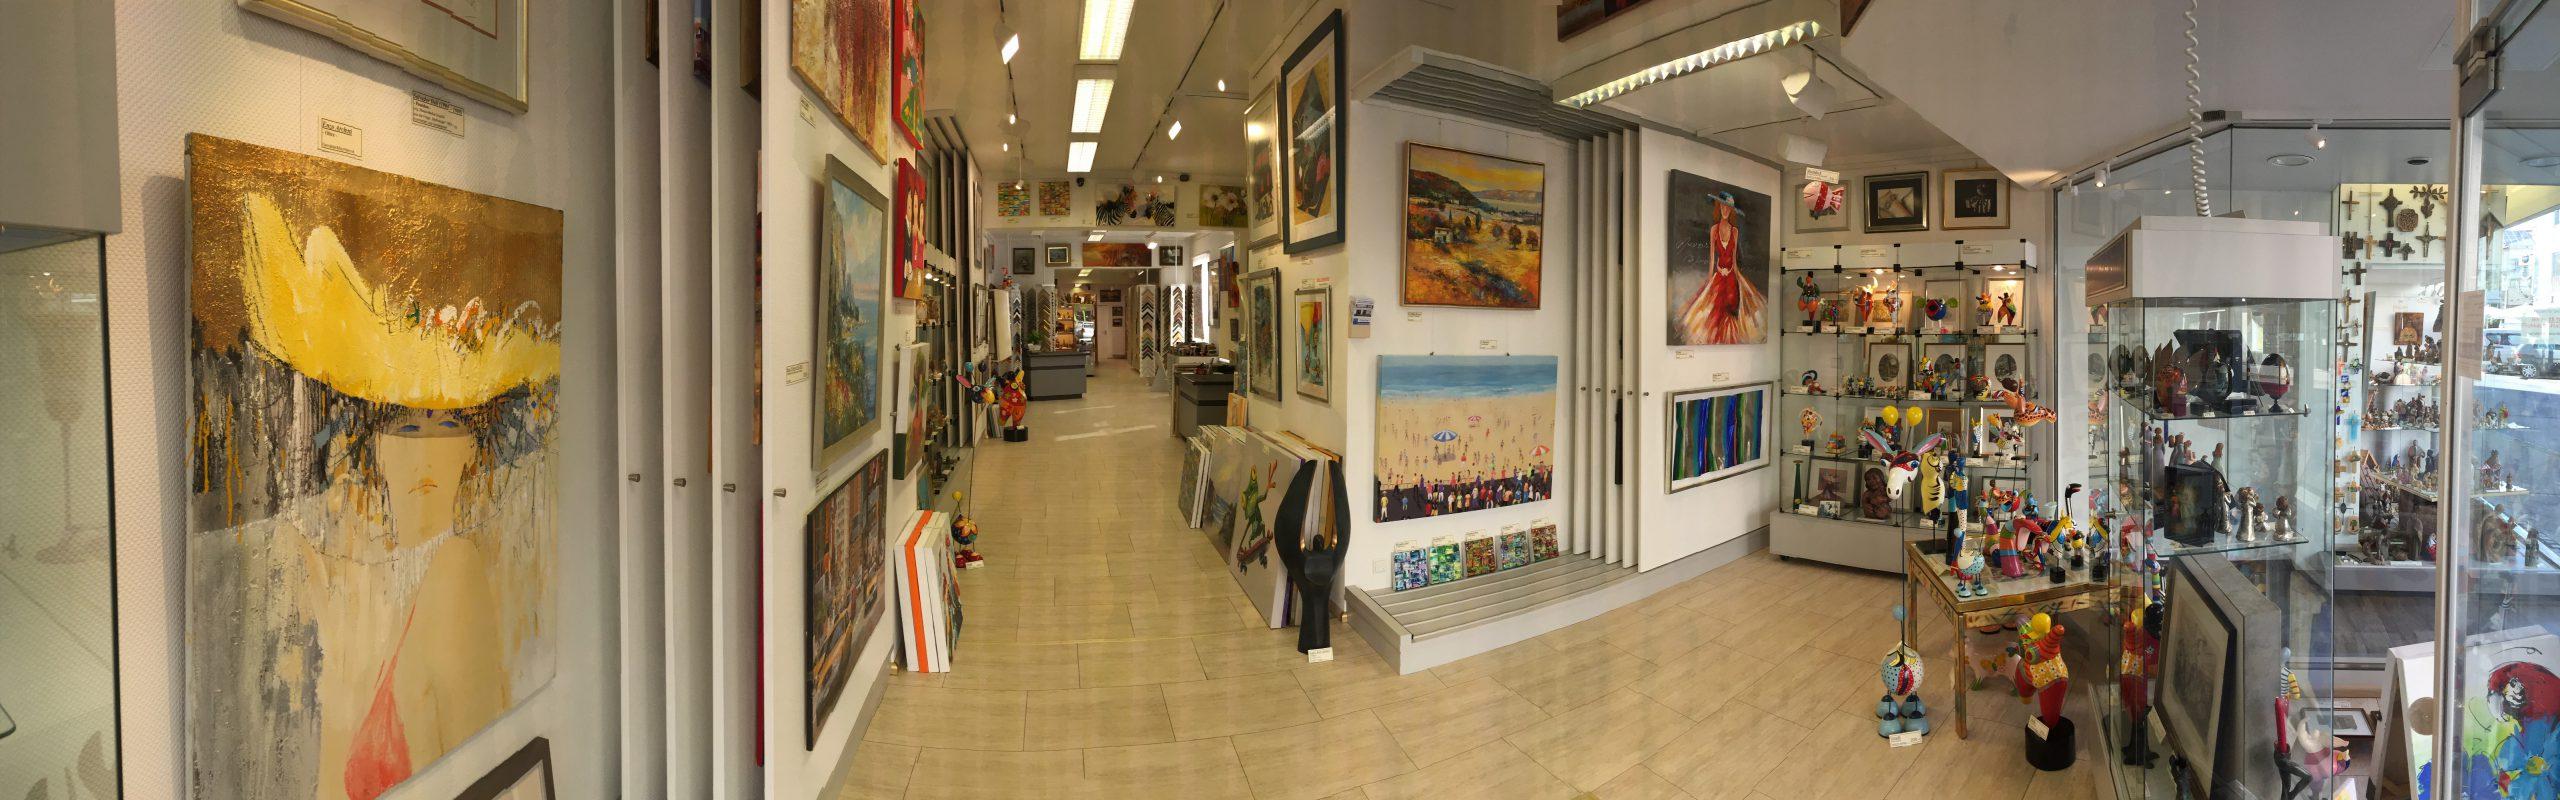 Galerie Eingang